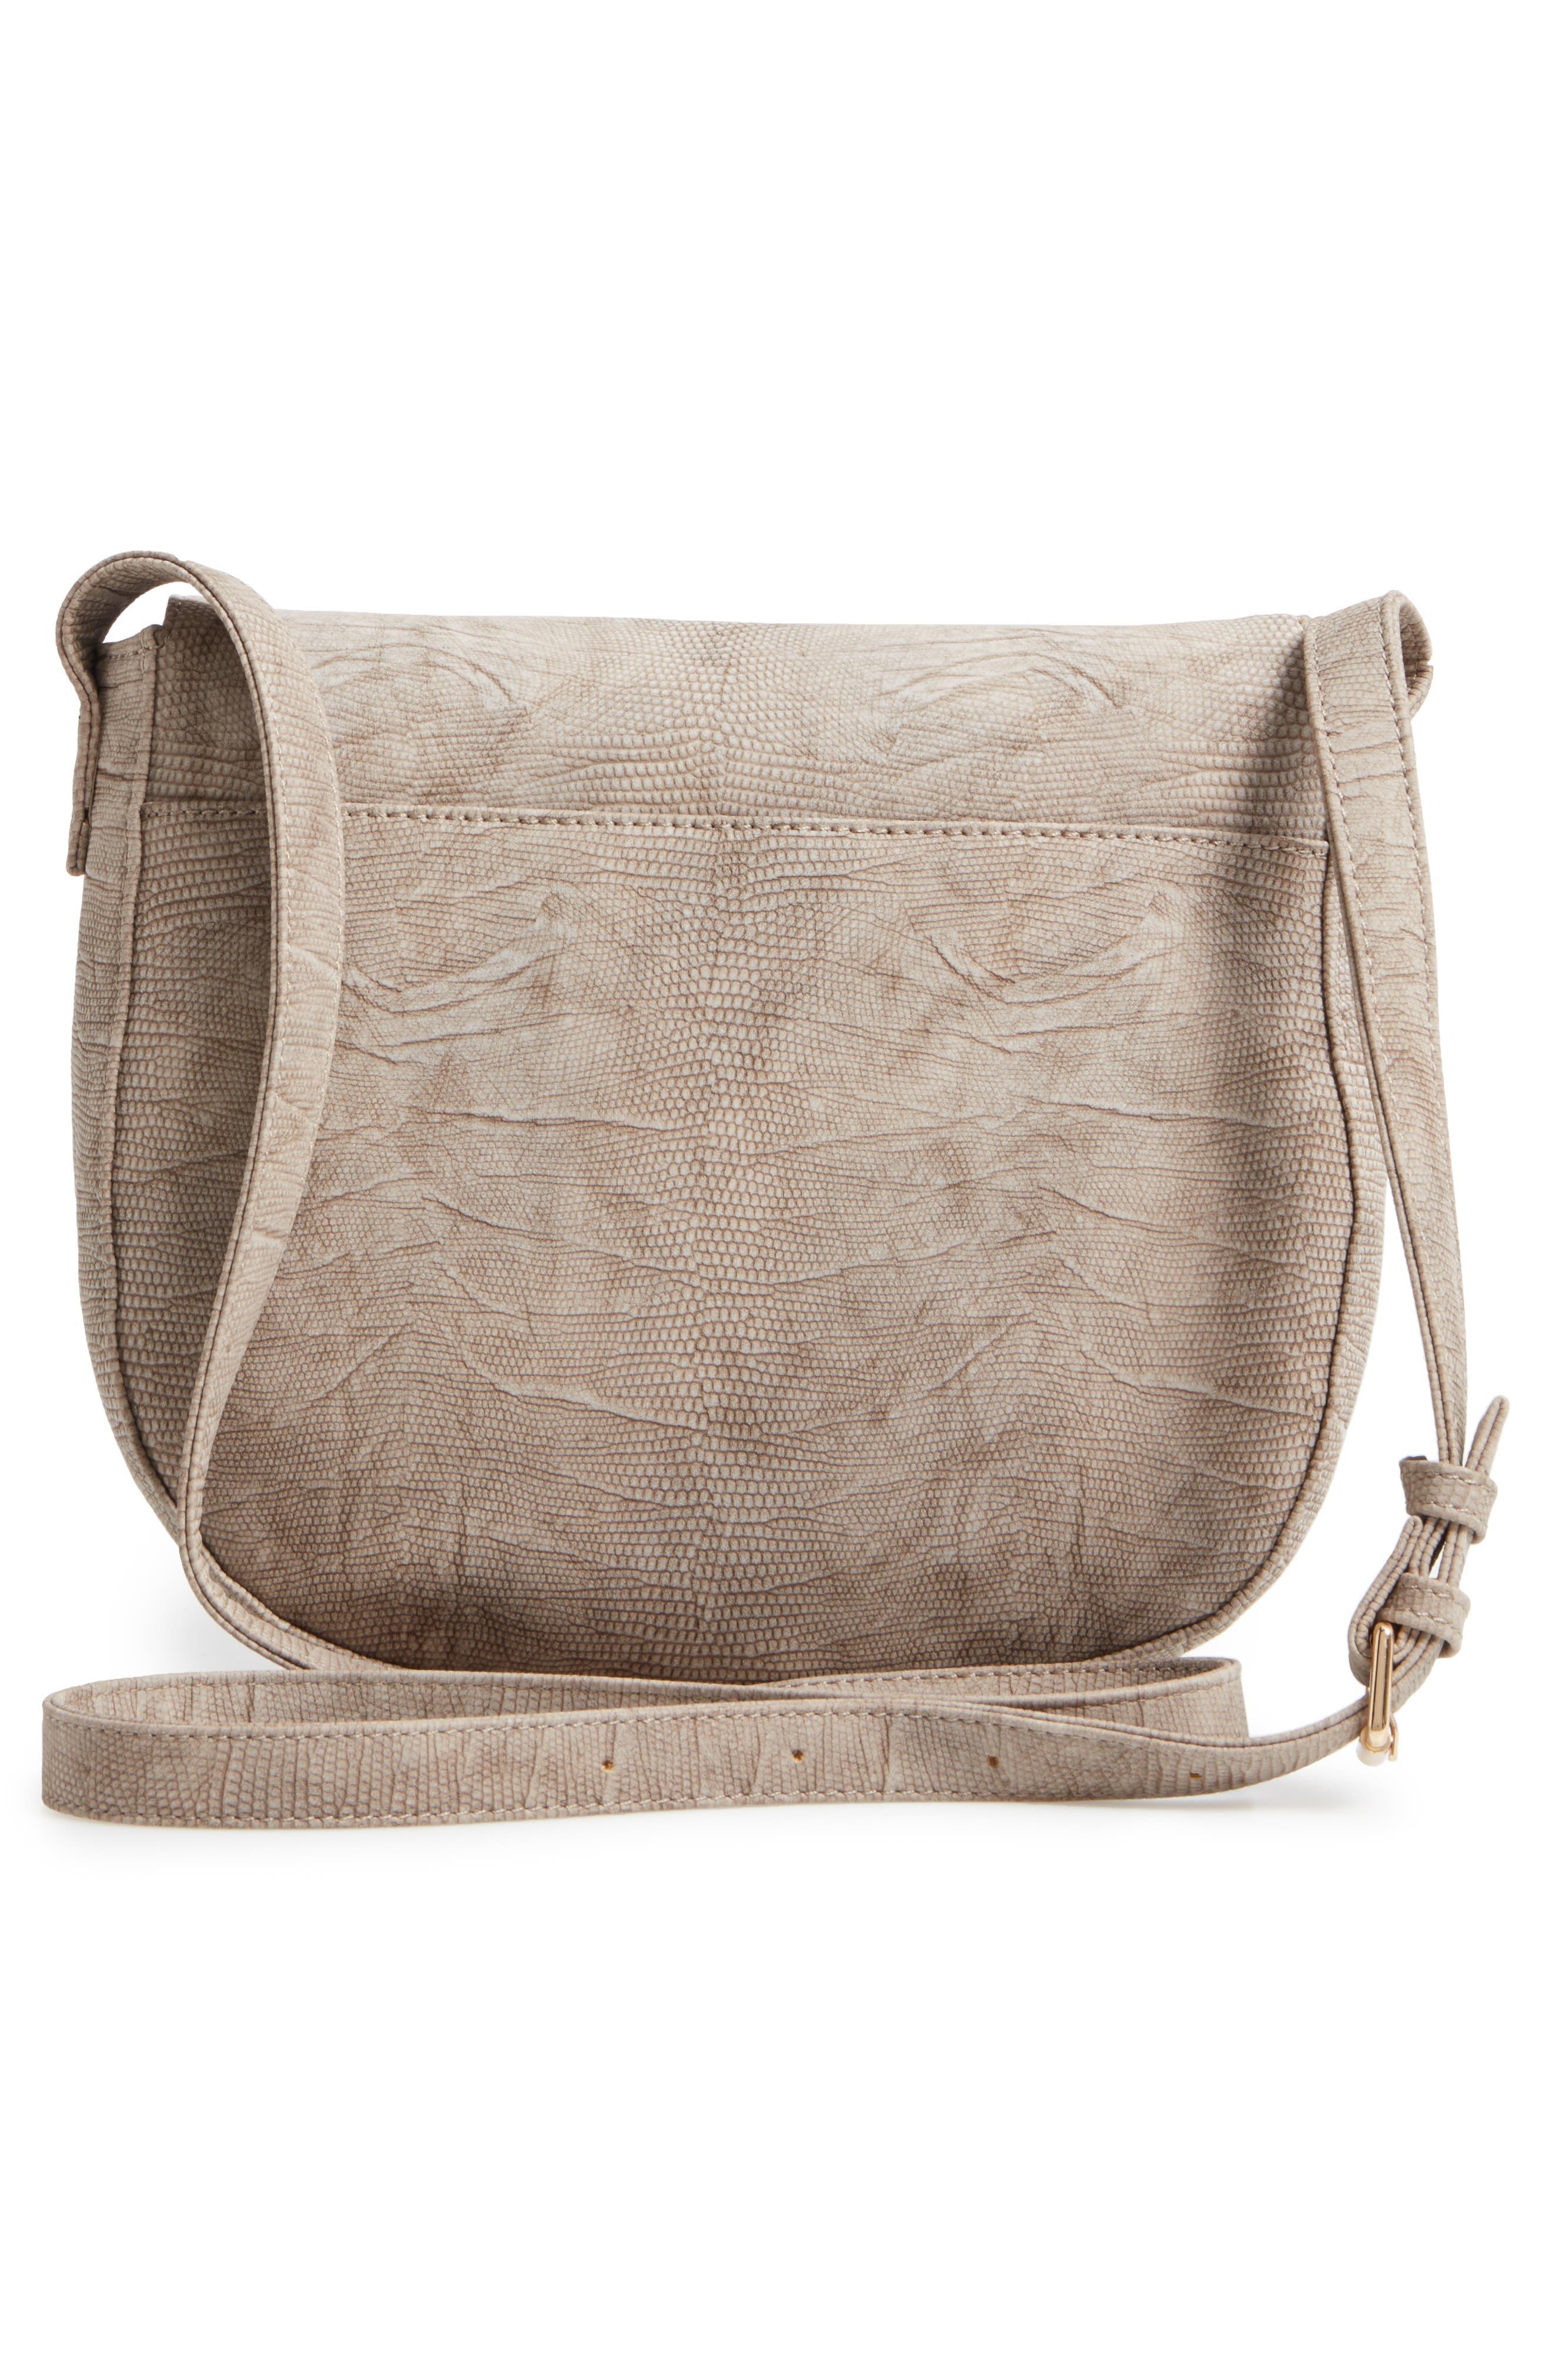 Livvy Faux Leather Crossbody Saddle Bag,                             Alternate thumbnail 3, color,                             250